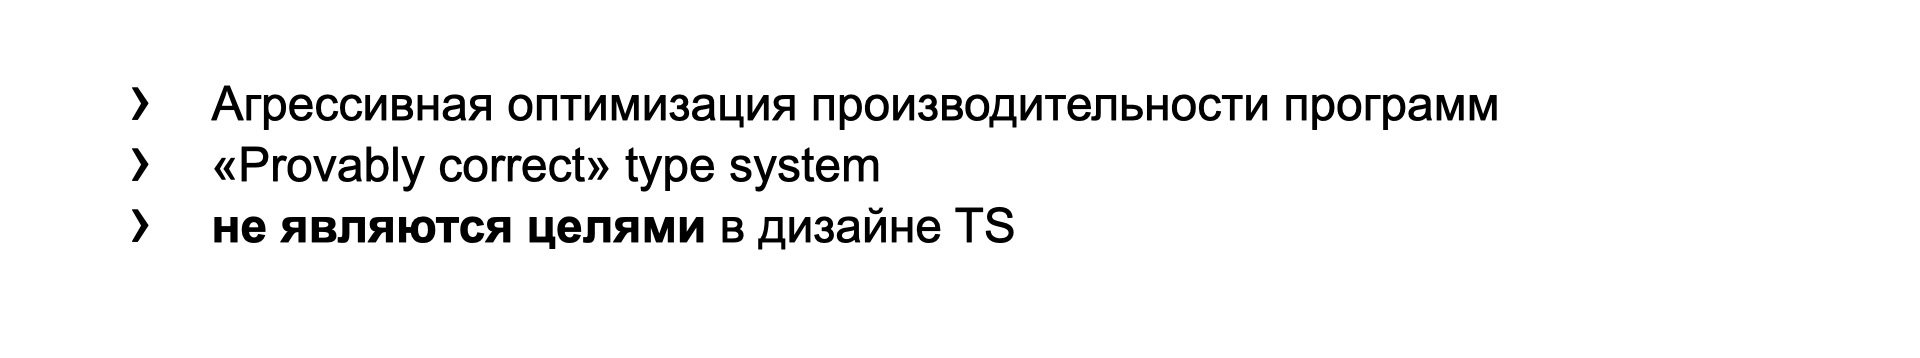 3pkh7xicyj4qsurz-xol2_ef5lm.jpeg